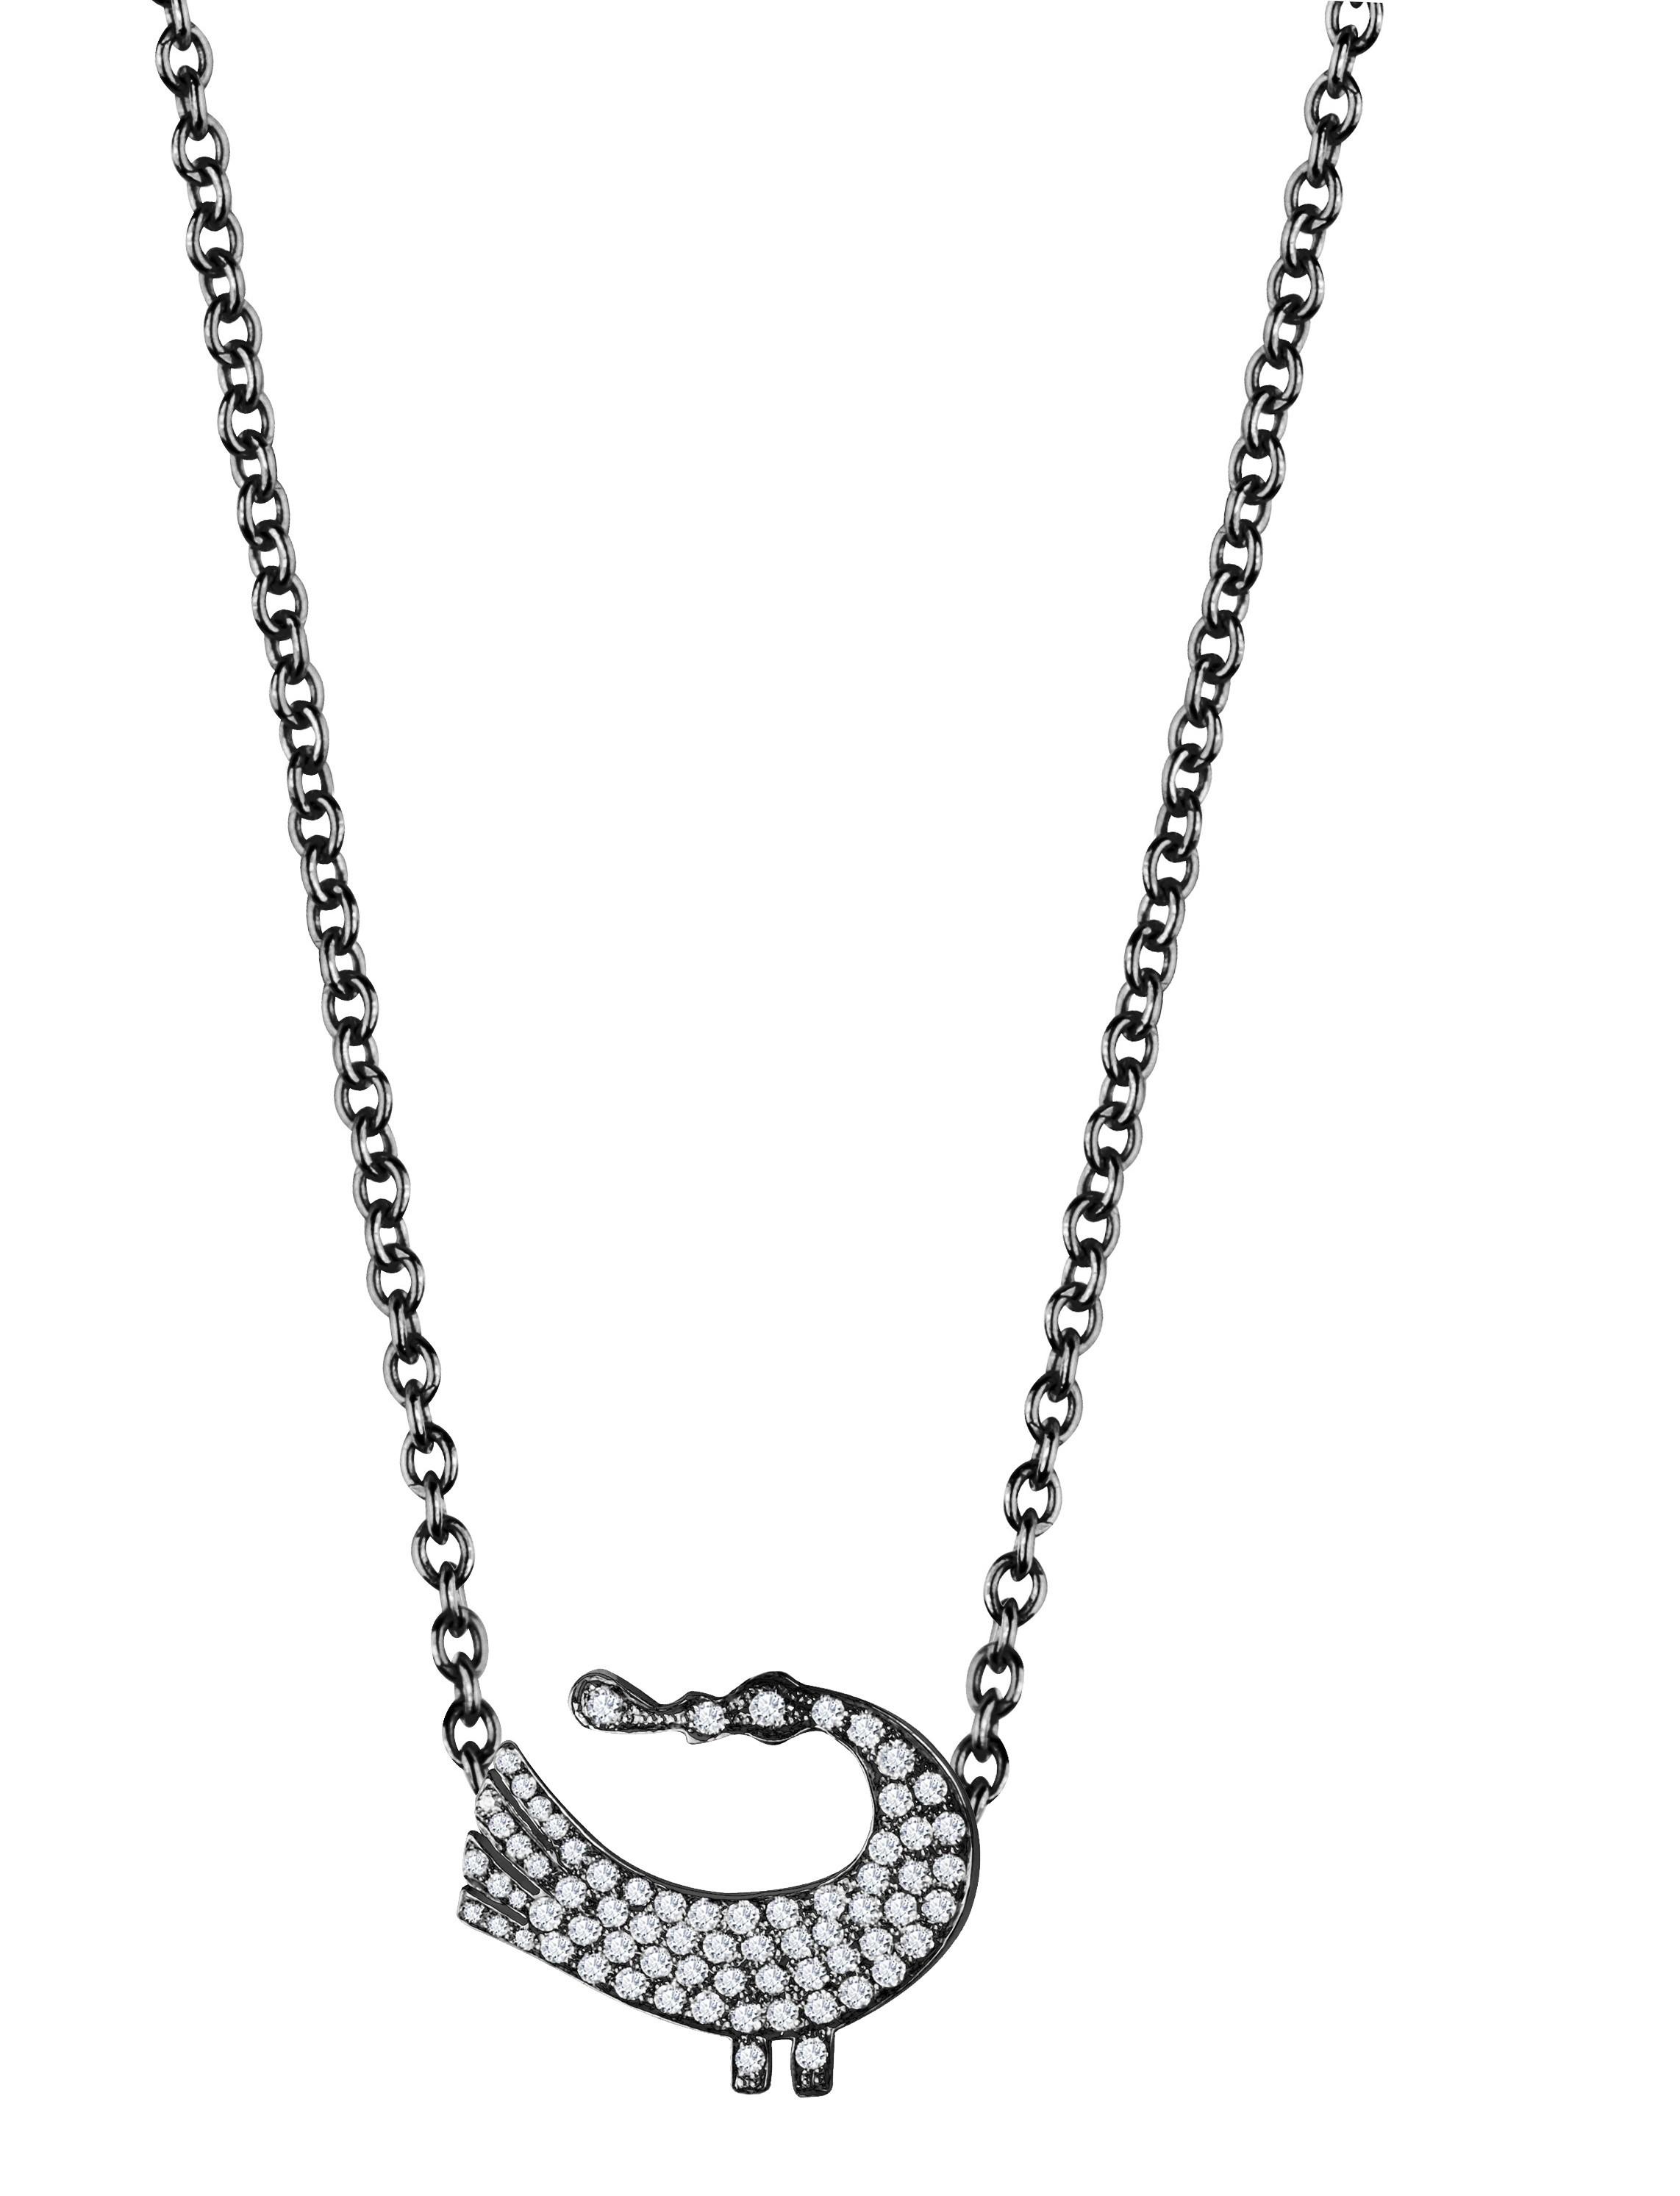 Sagesse Bakwani7 Or diamants – Collier